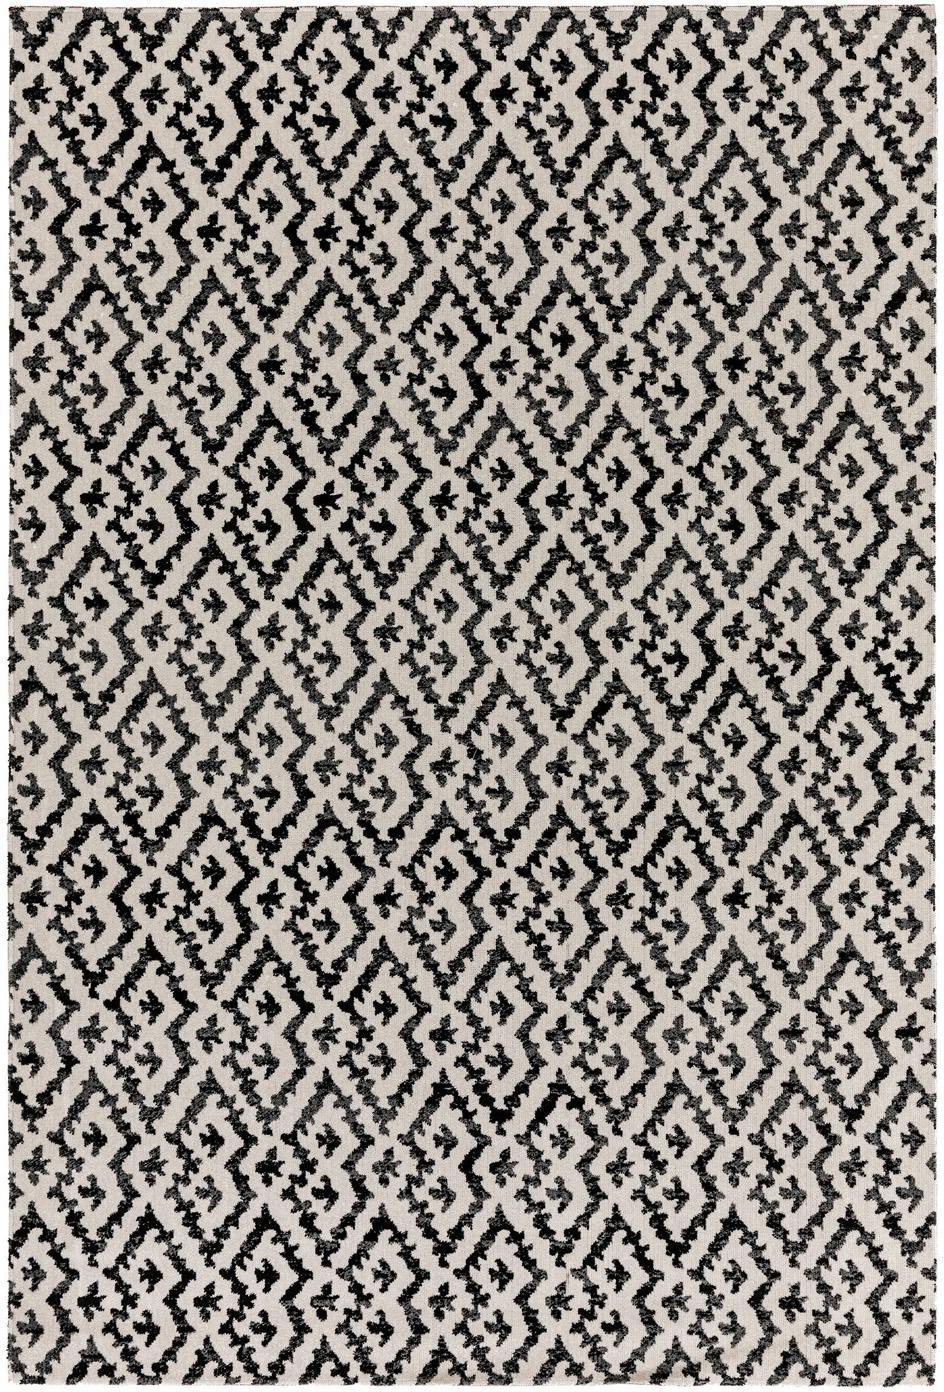 Alfombra de interior/exterior Jerry, estilo étnico, 100%polipropileno, Negro, blanco, An 80 x L 150 cm (Tamaño XS)